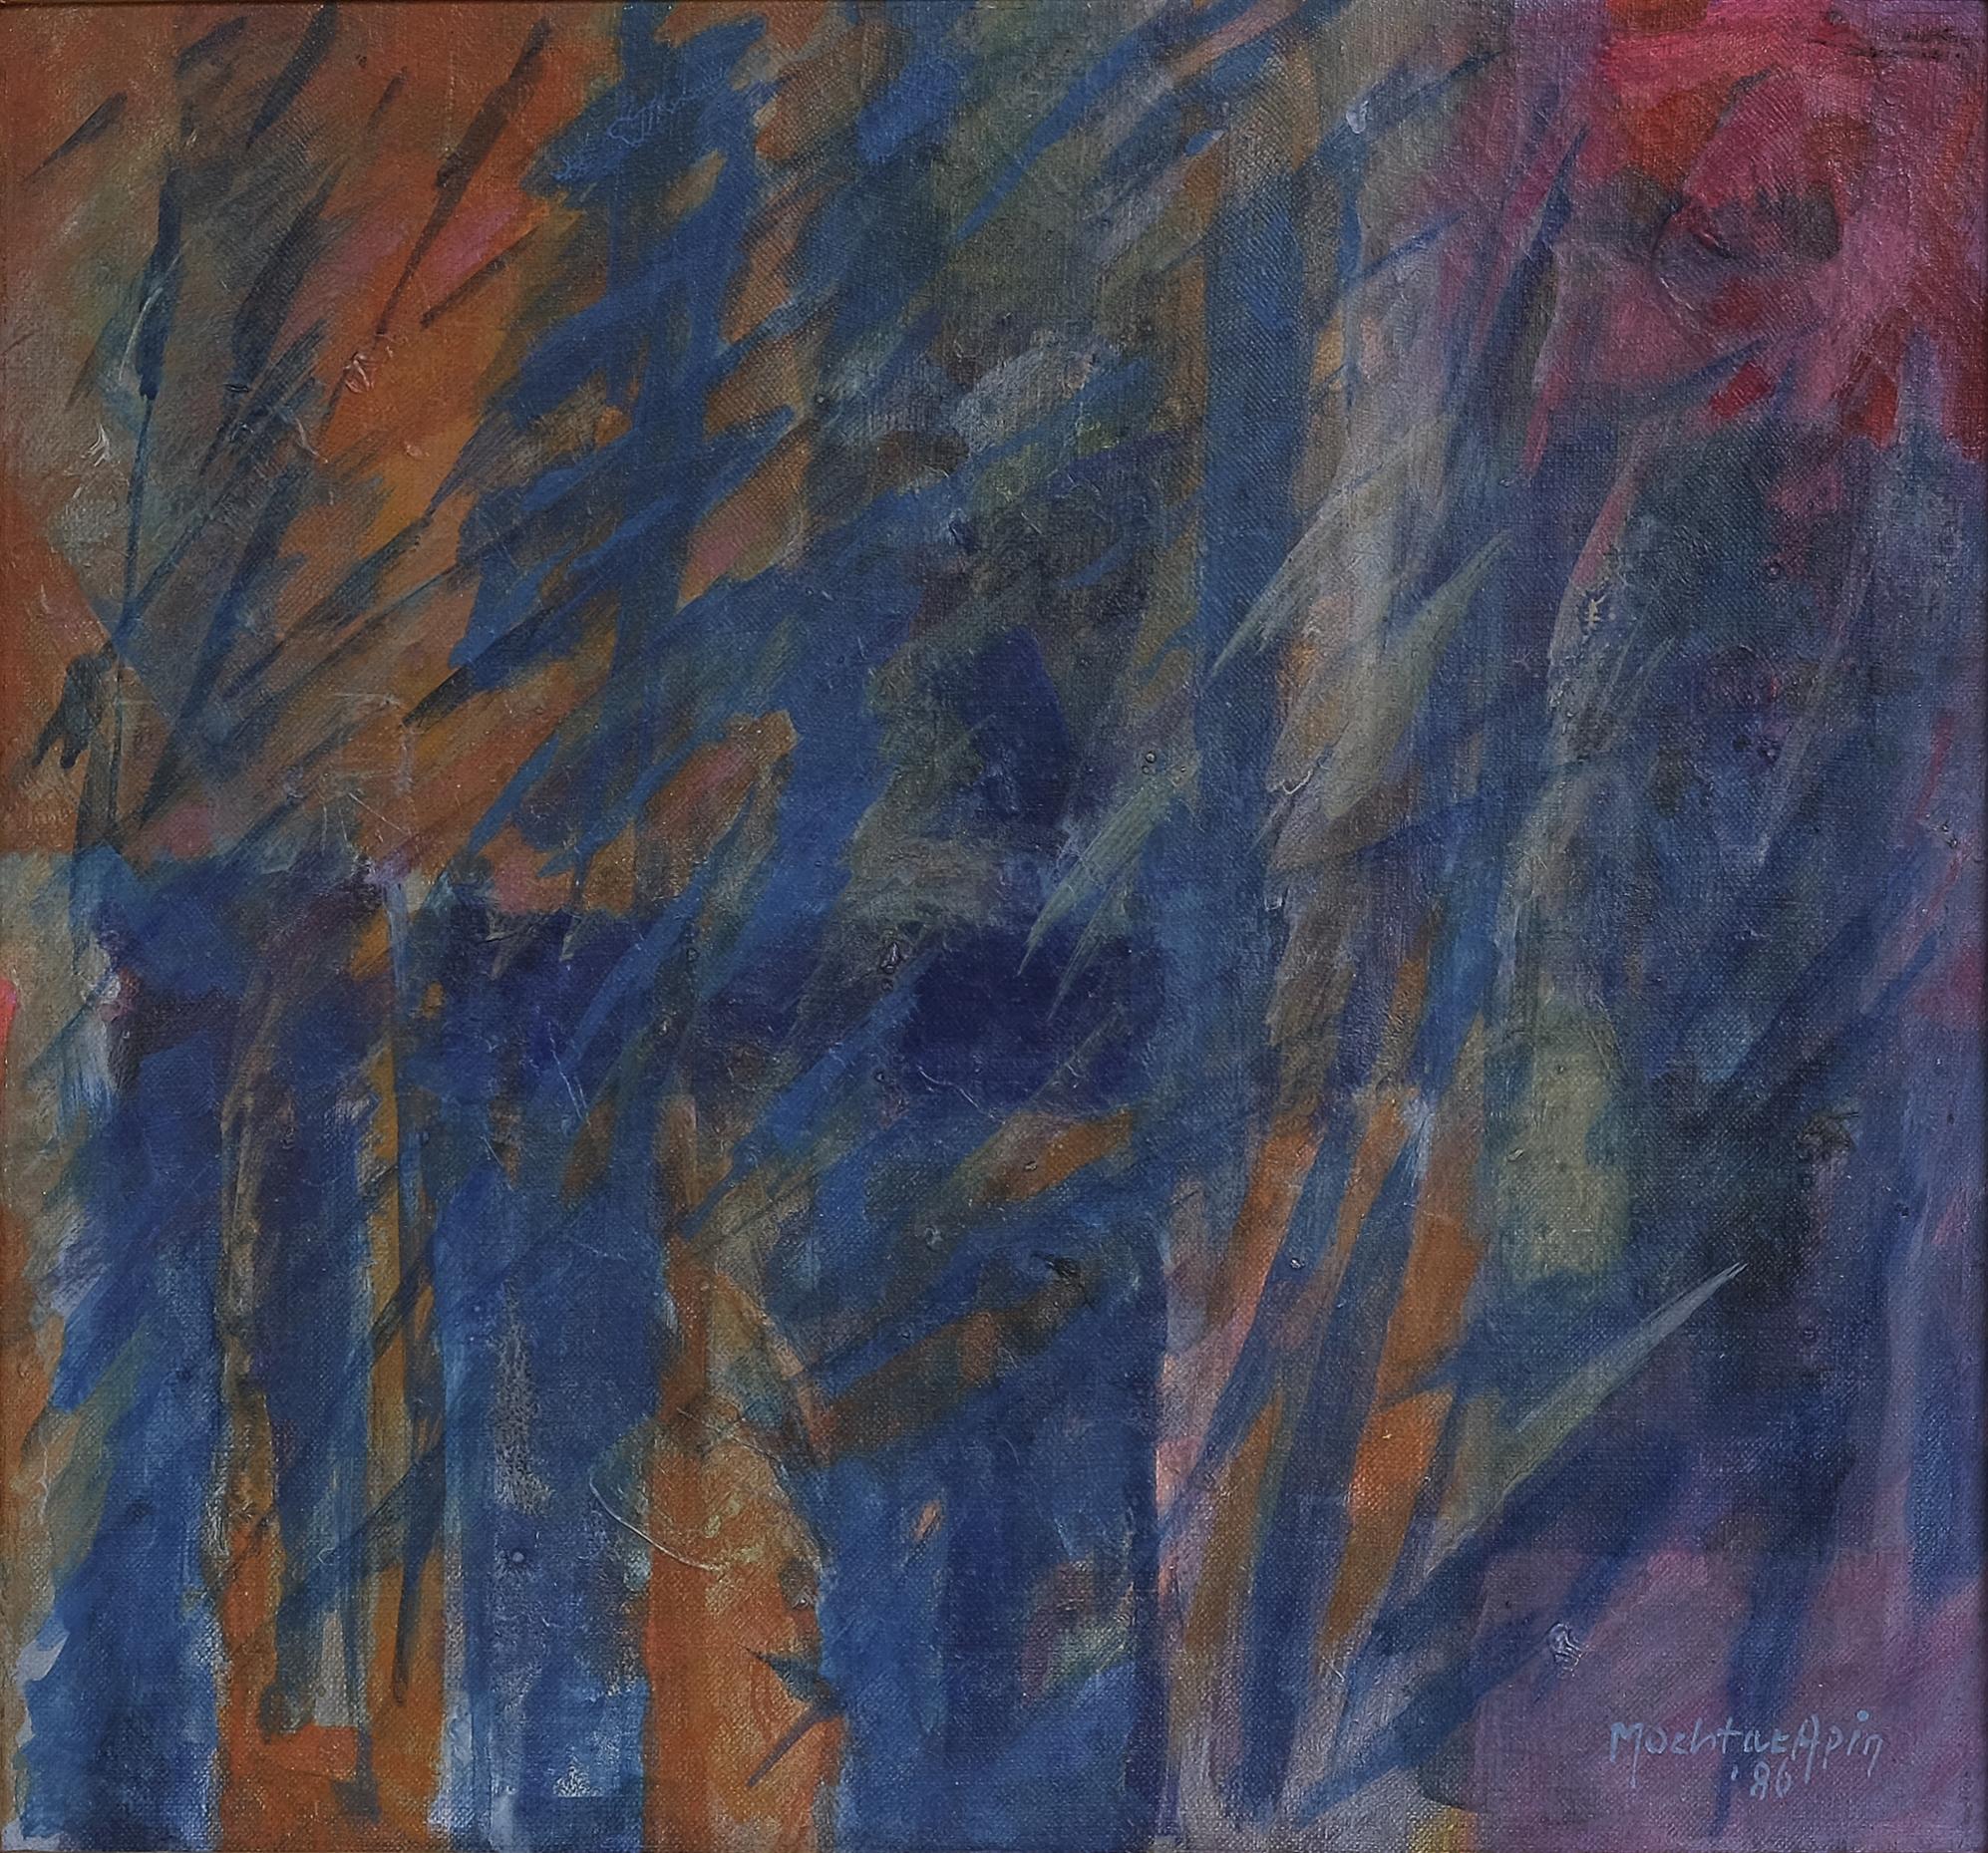 Mochtar Apin, Rumput Liar & Padi Harapan (Wild Grass), acrylic on canvas, 39 x 42 cm, 1986